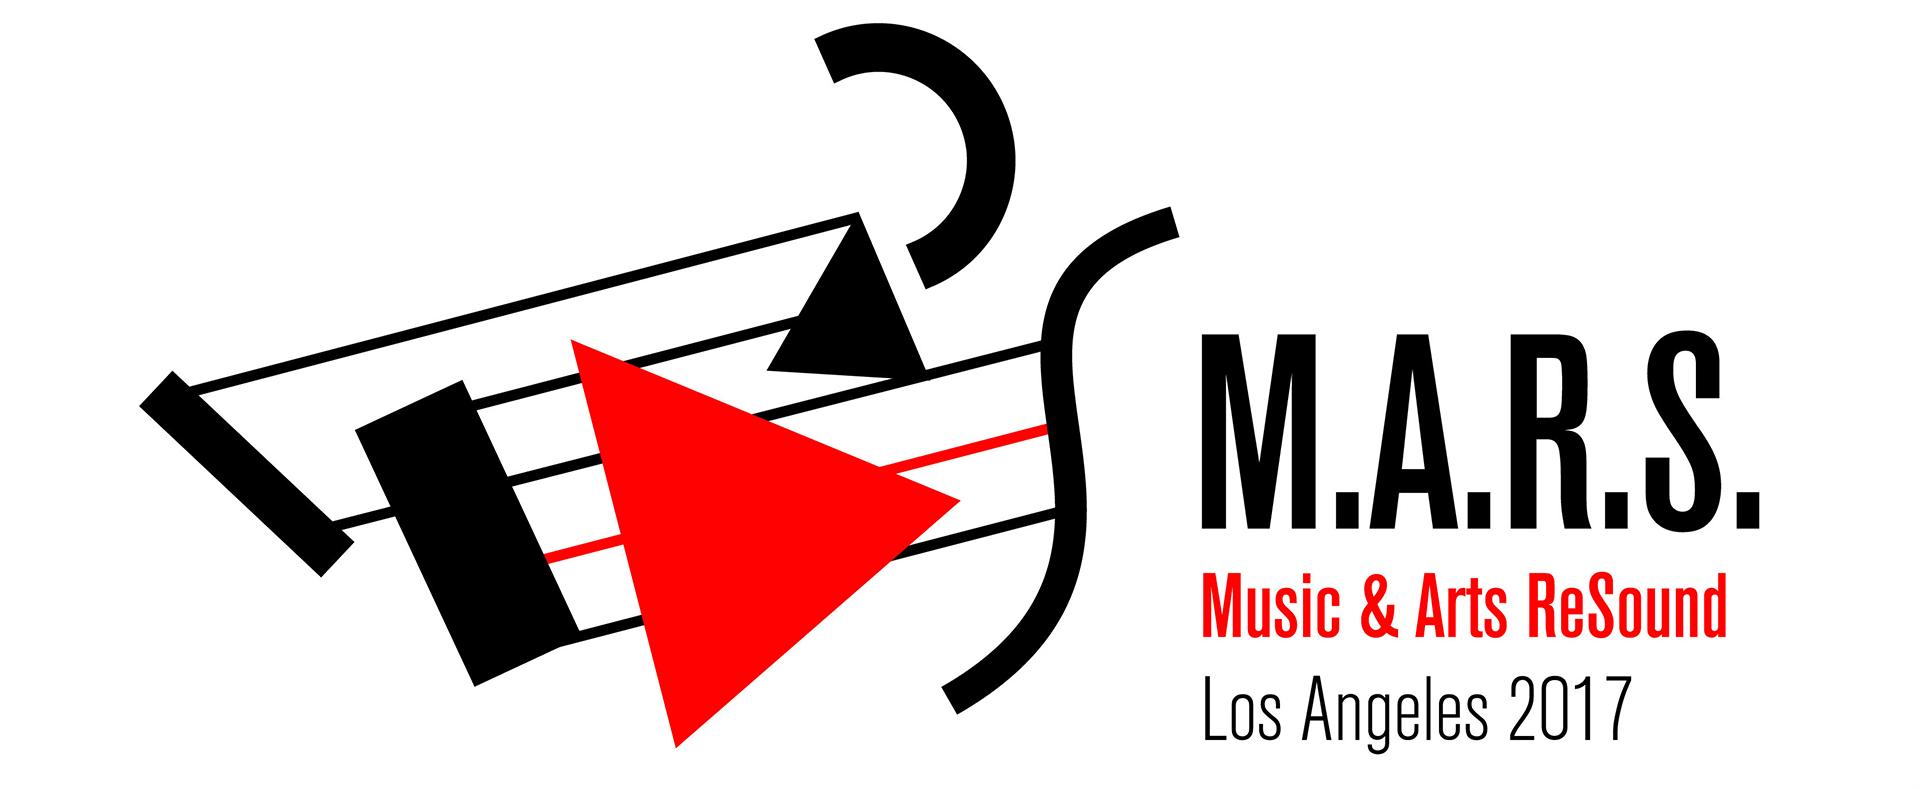 M.A.R.S. festival logo